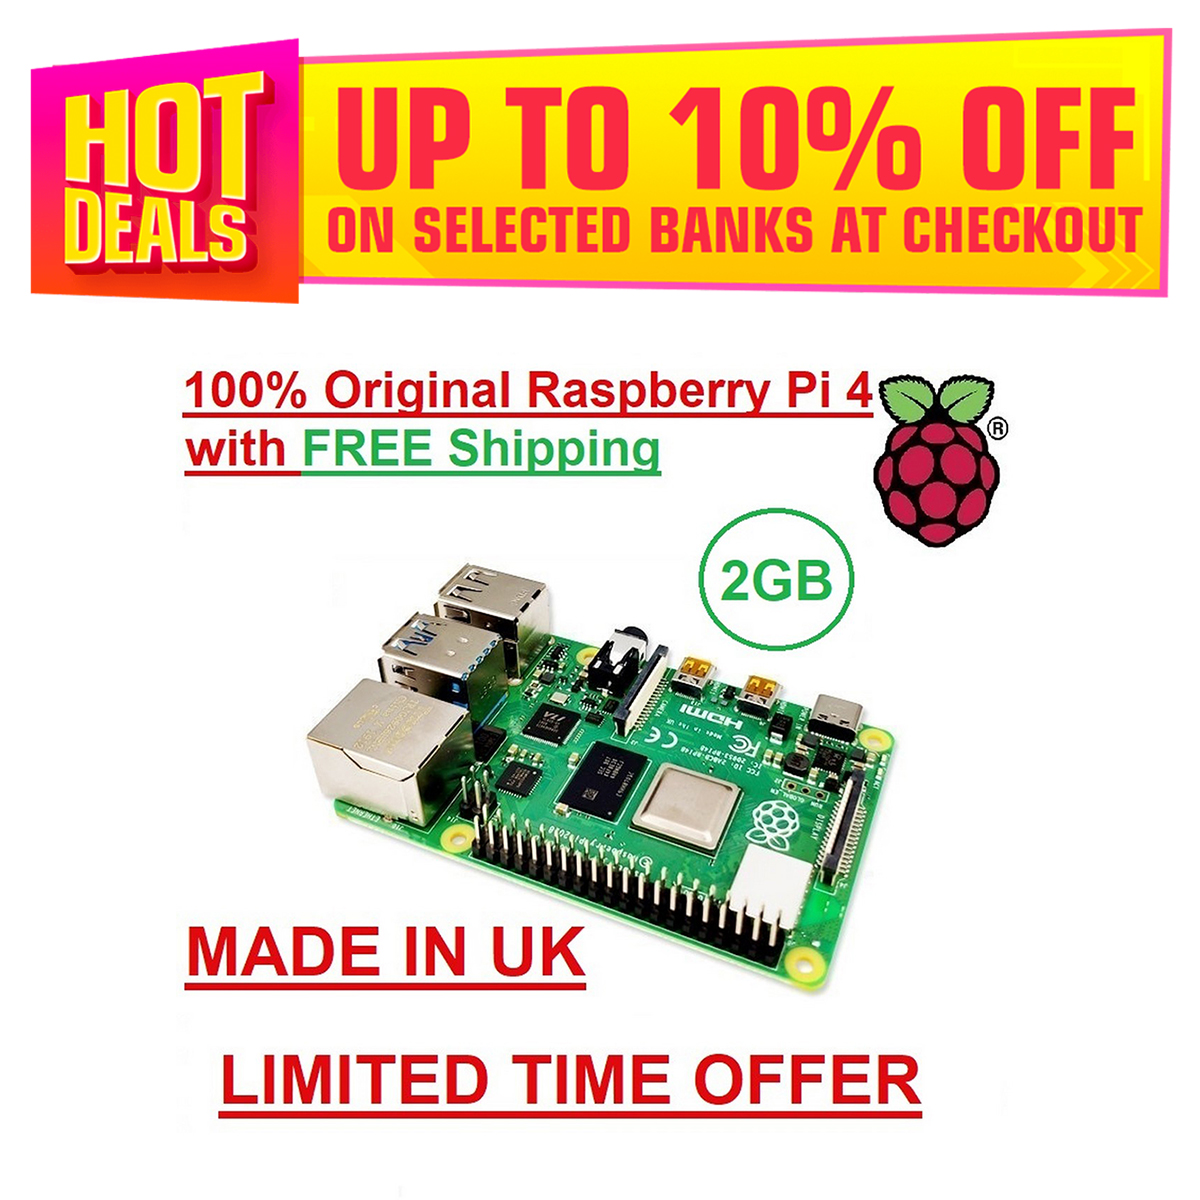 Official Original Raspberry Pi 4 Model B 2GB RAM Development Board Kit 4 Core CPU 1.5Ghz